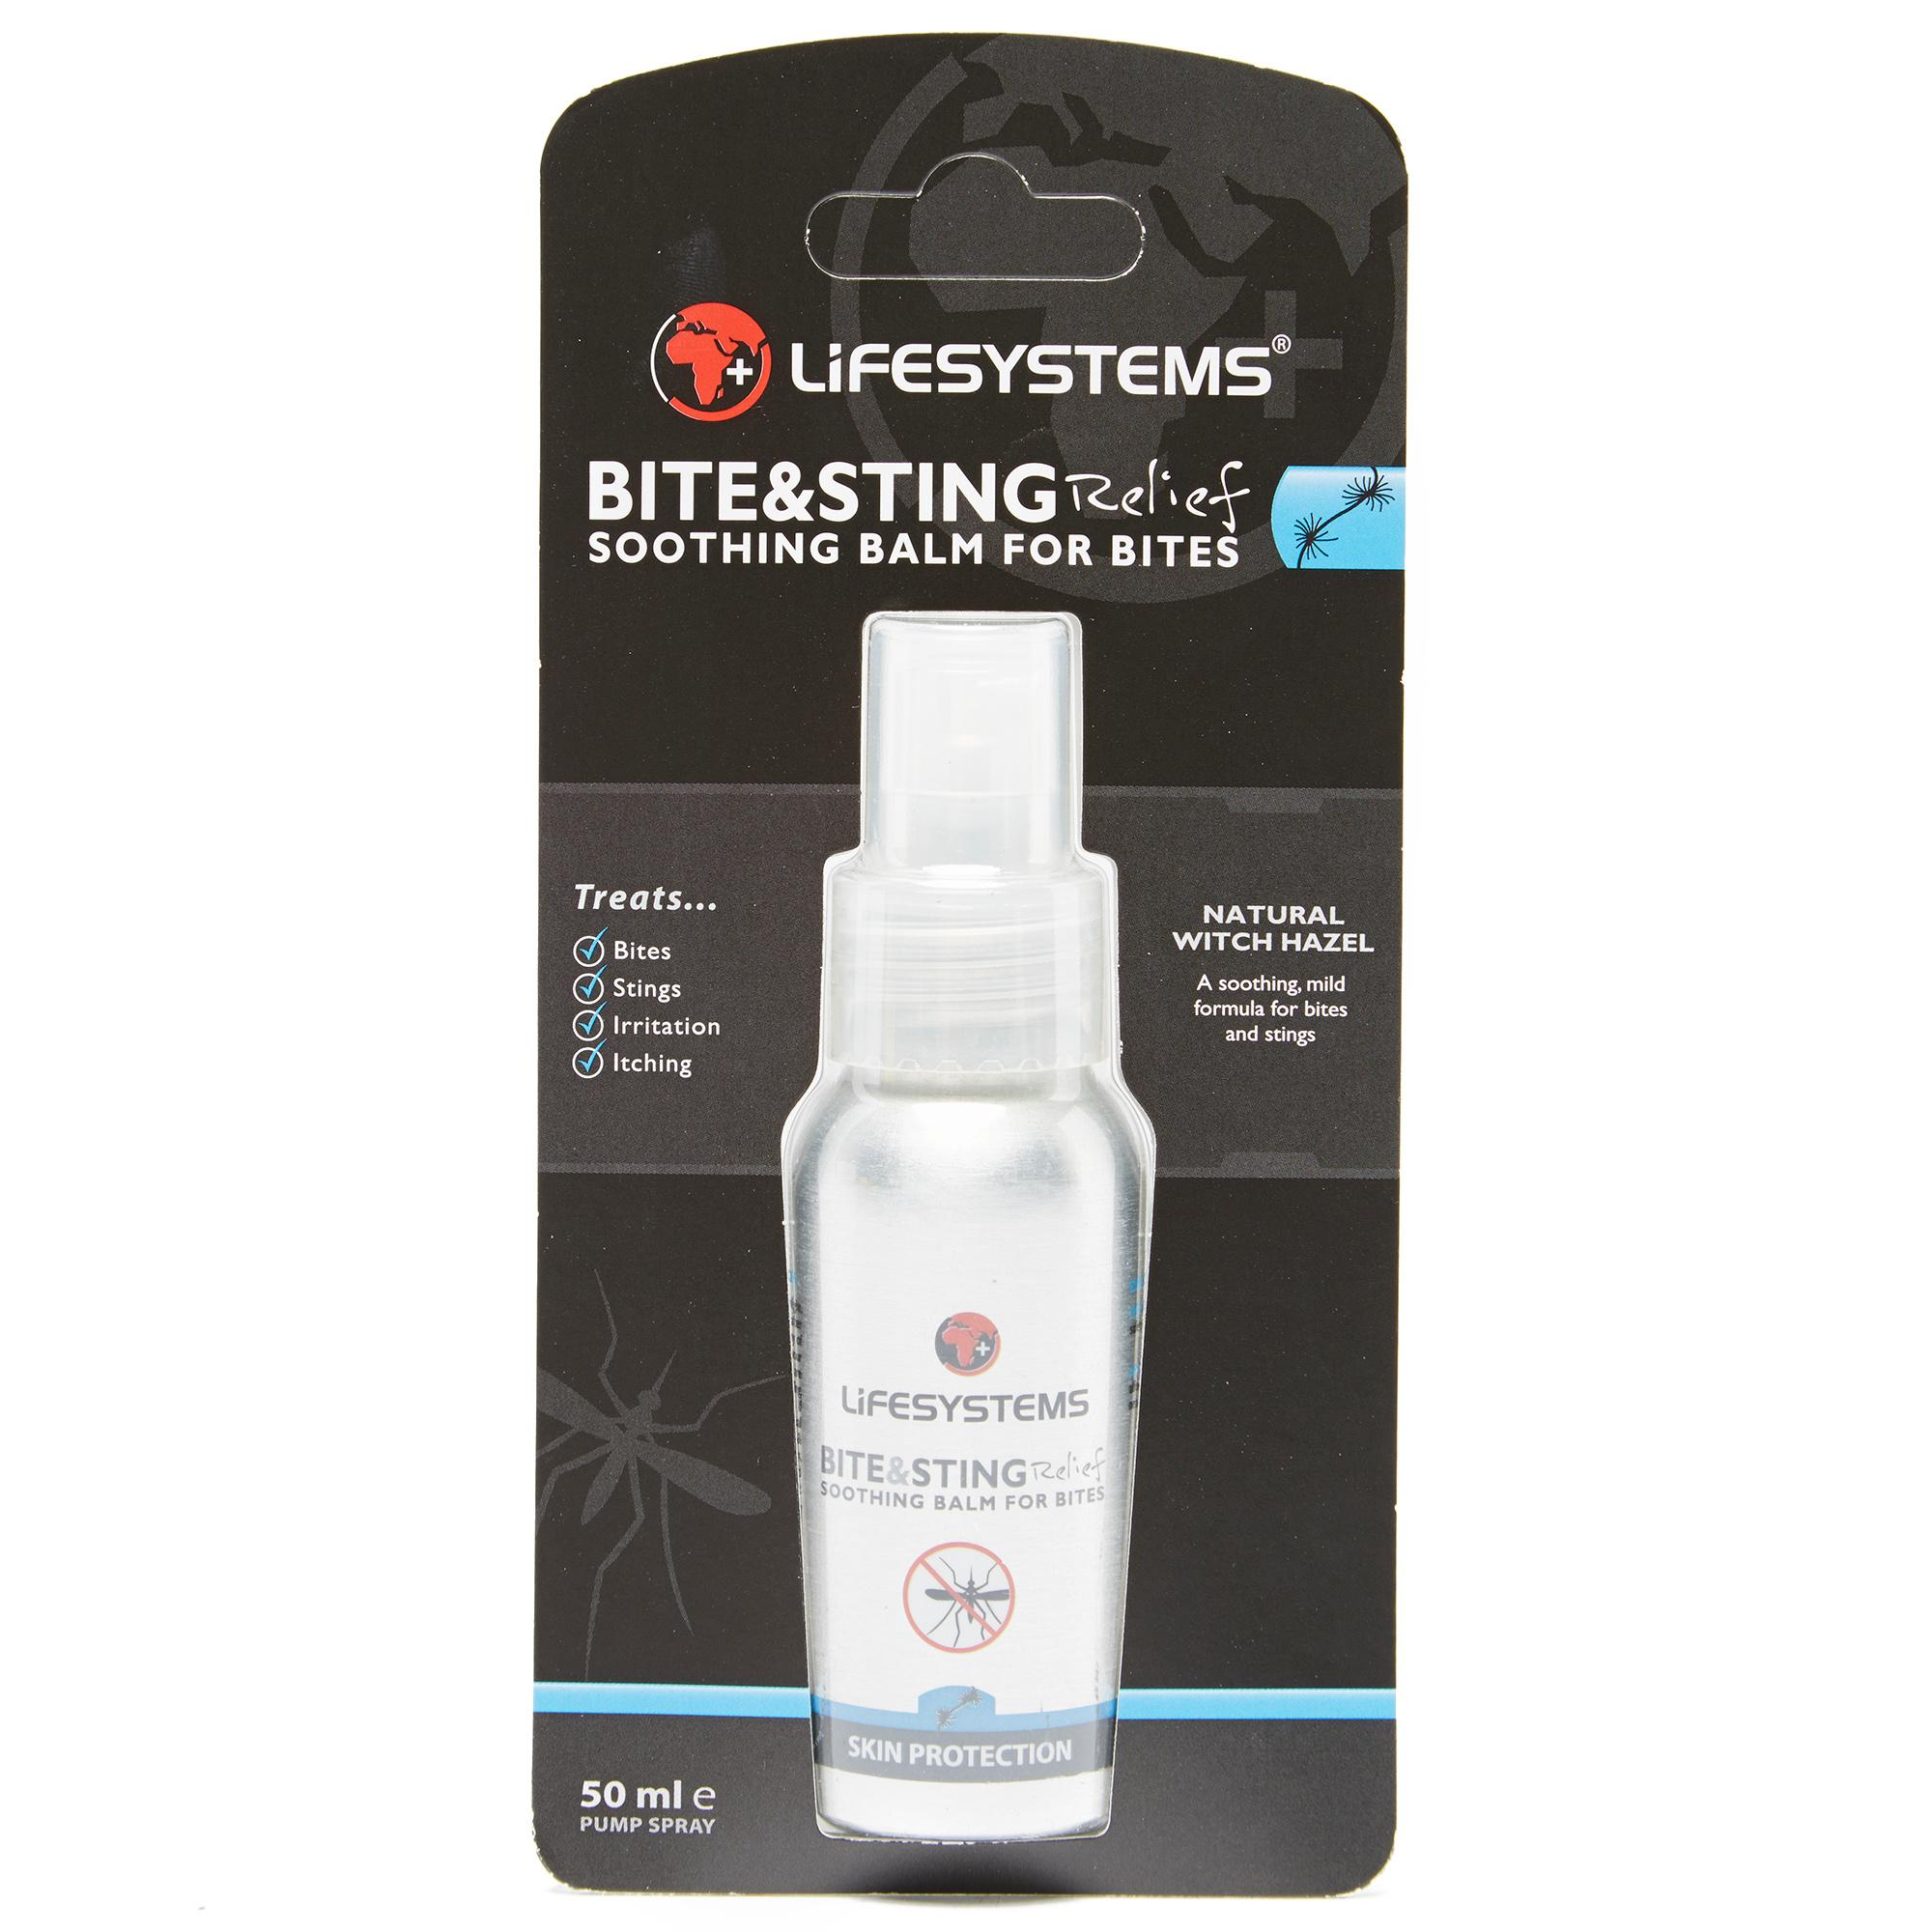 Lifesystems Bite & Sting Relief Spray, N/A